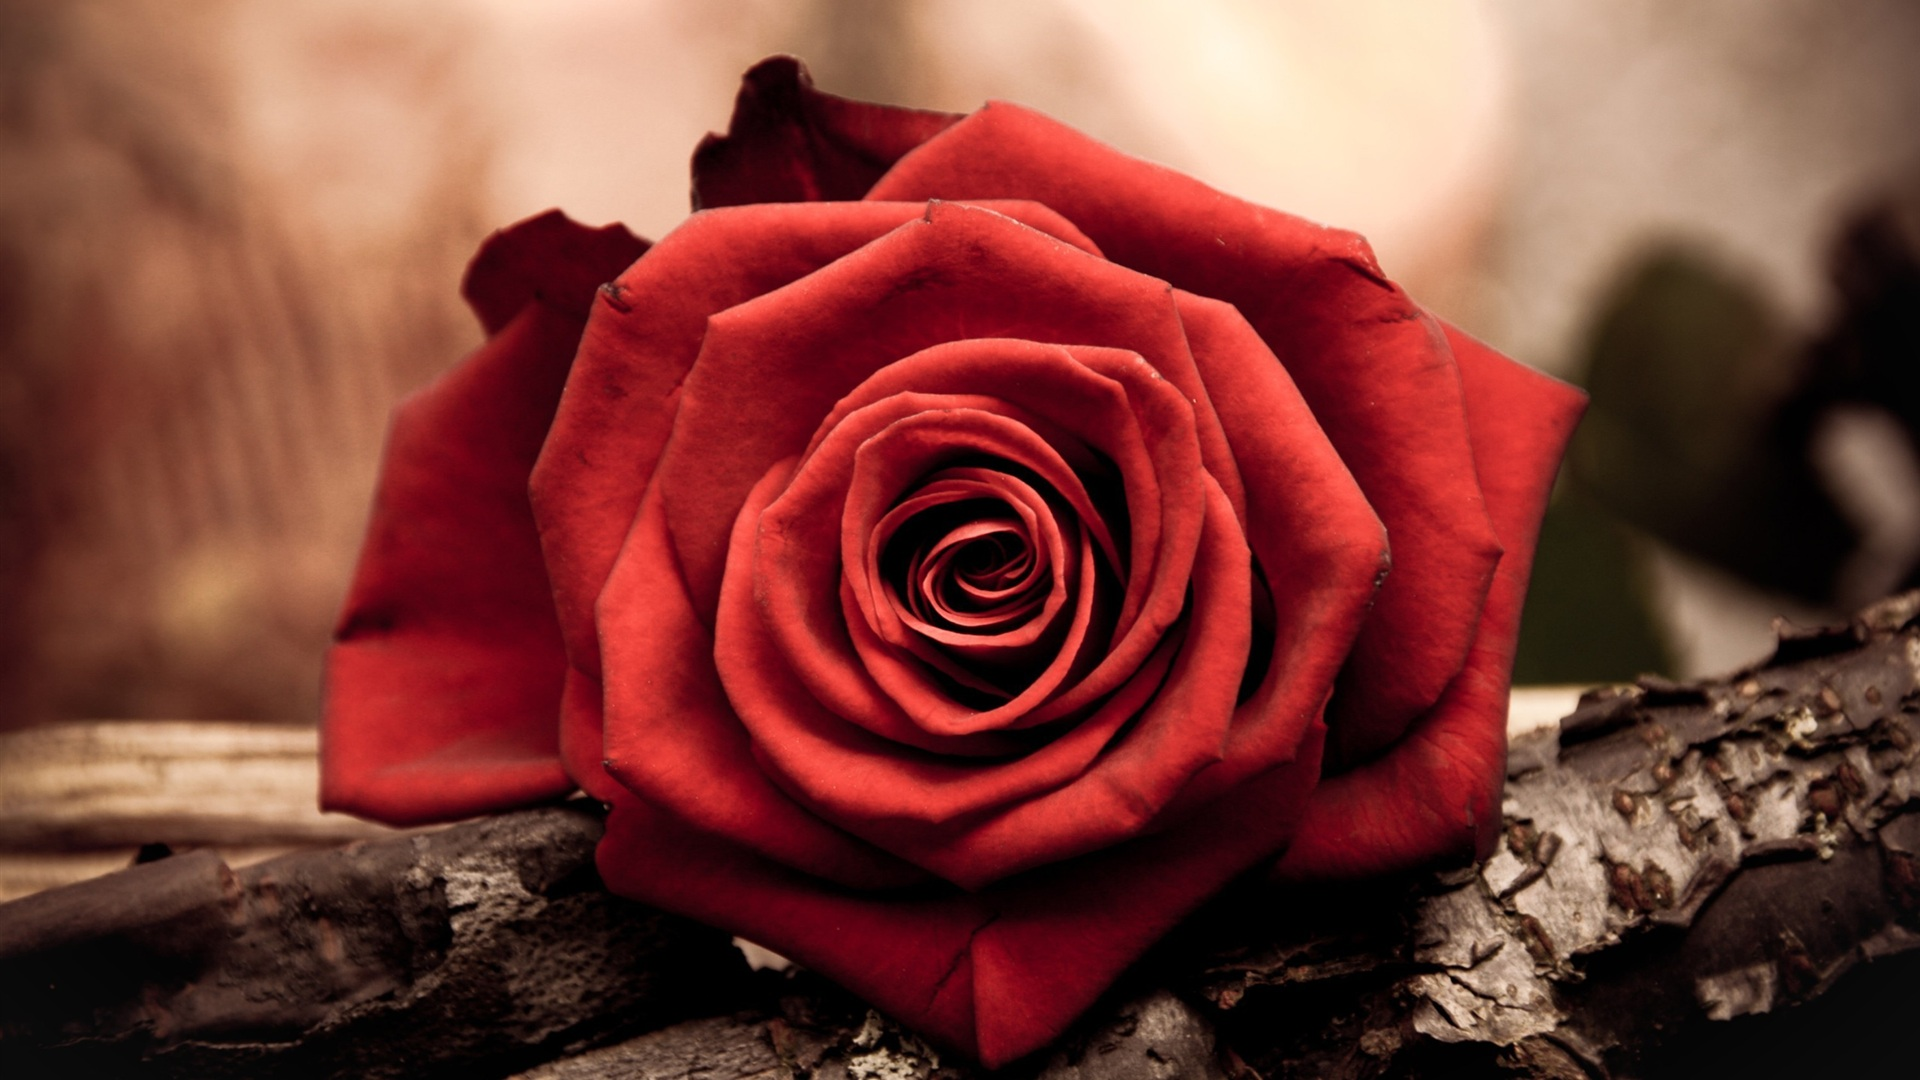 red rose flower desktop wallpaper 1920x1080   Magic4Wallscom 1920x1080